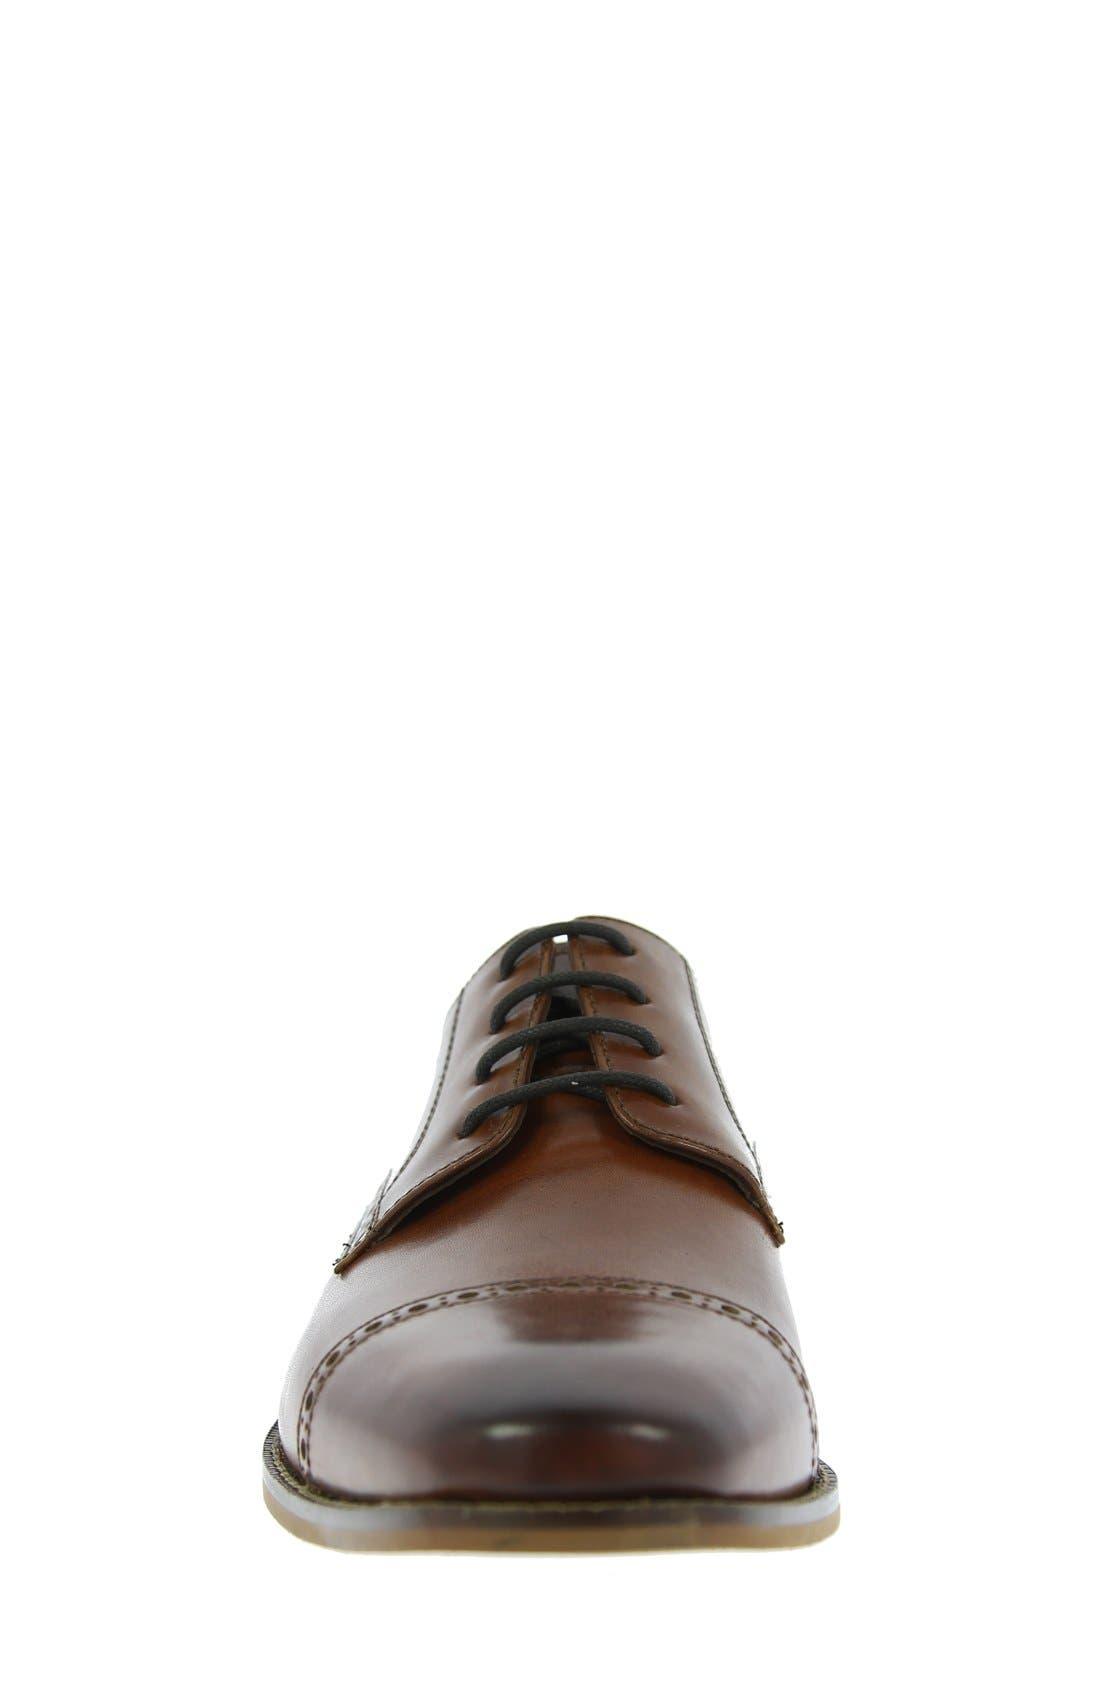 'Castellano' Cap Toe Derby,                             Alternate thumbnail 5, color,                             257